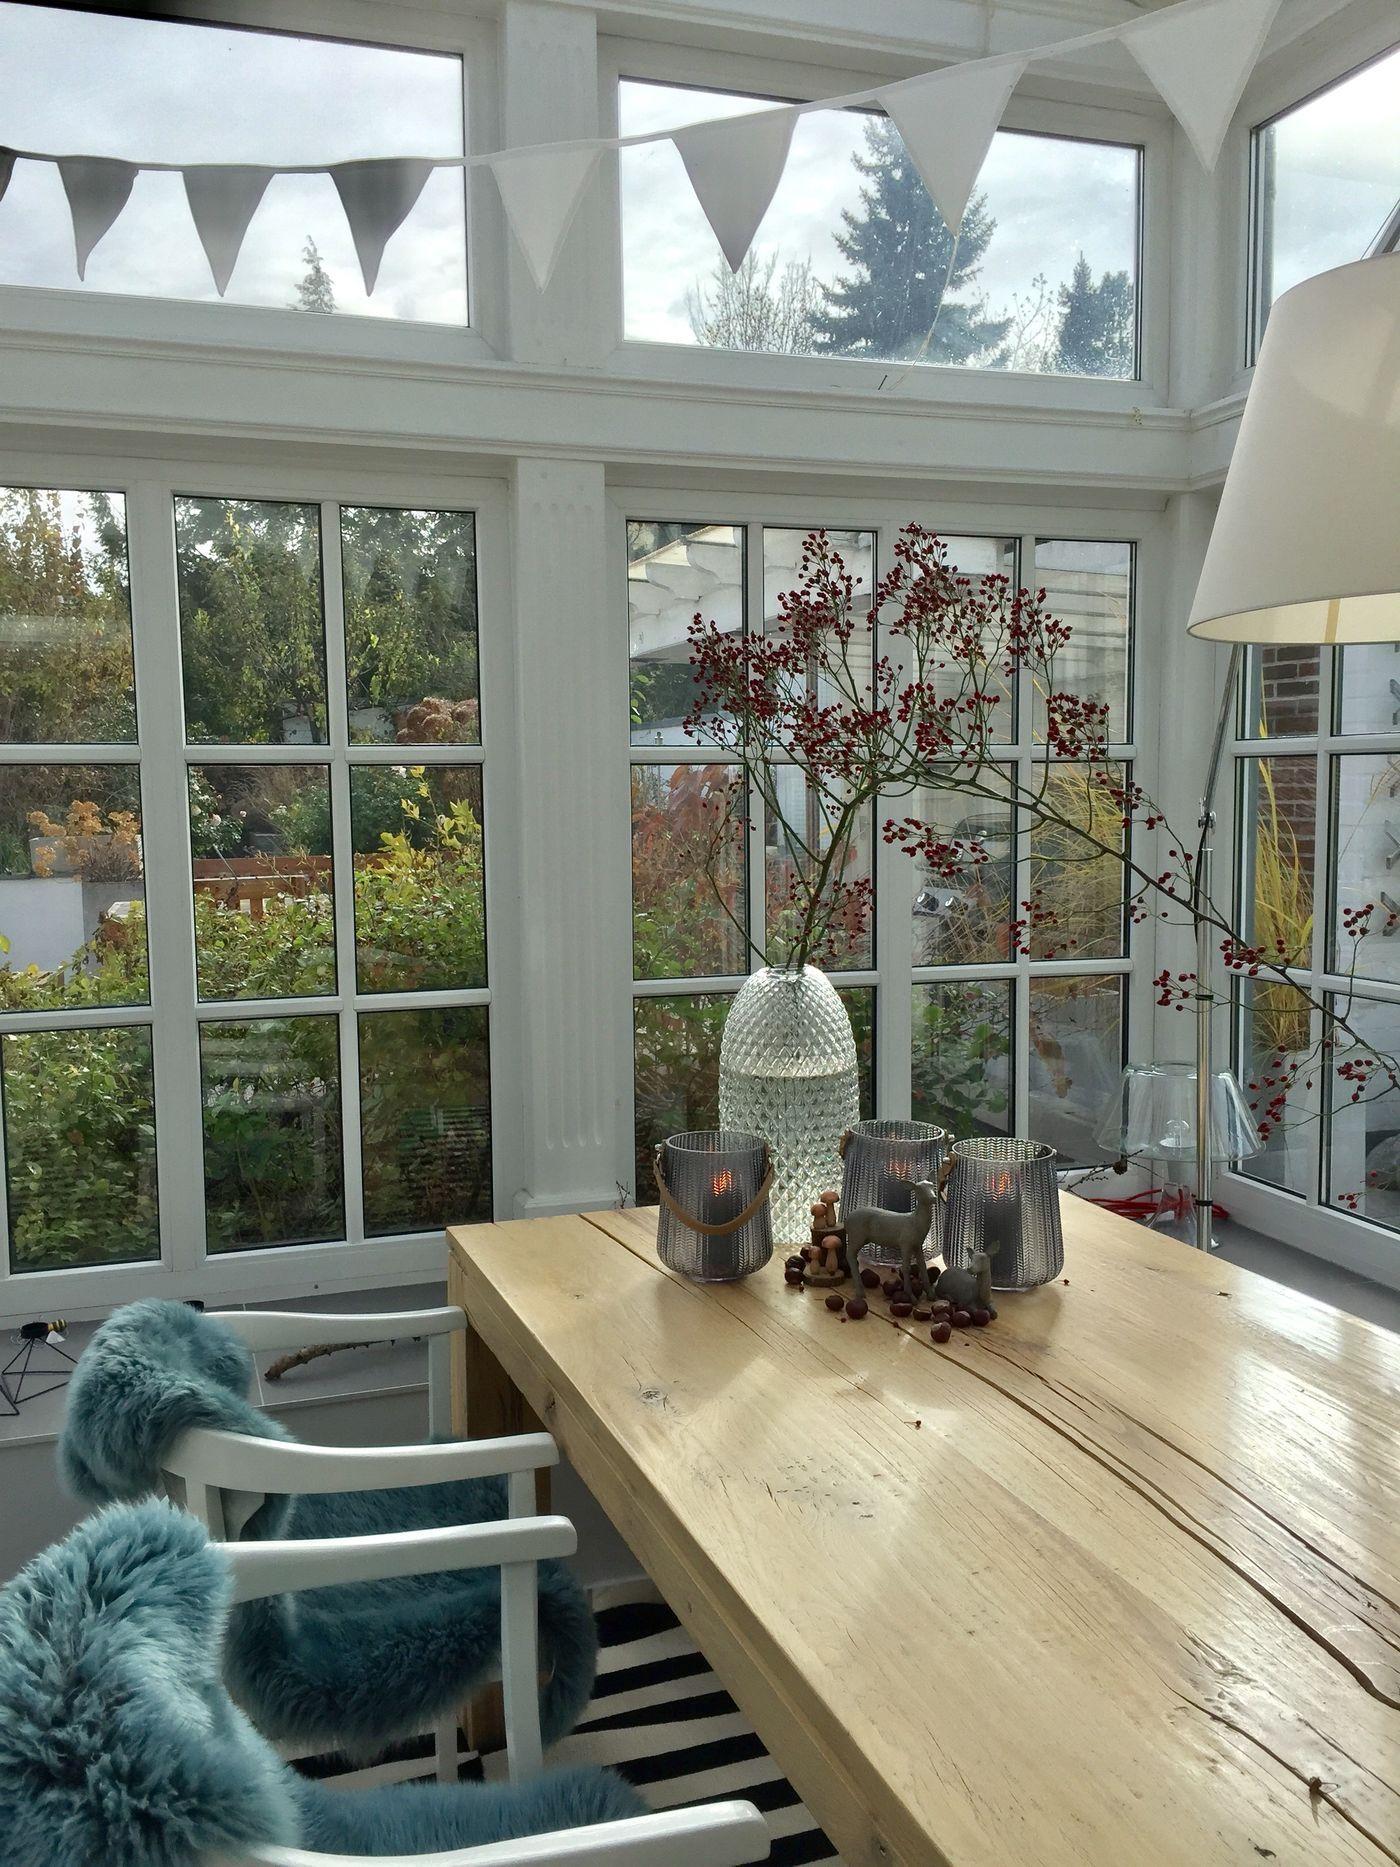 do it yourself ideen f r dein zuhause seite 55. Black Bedroom Furniture Sets. Home Design Ideas